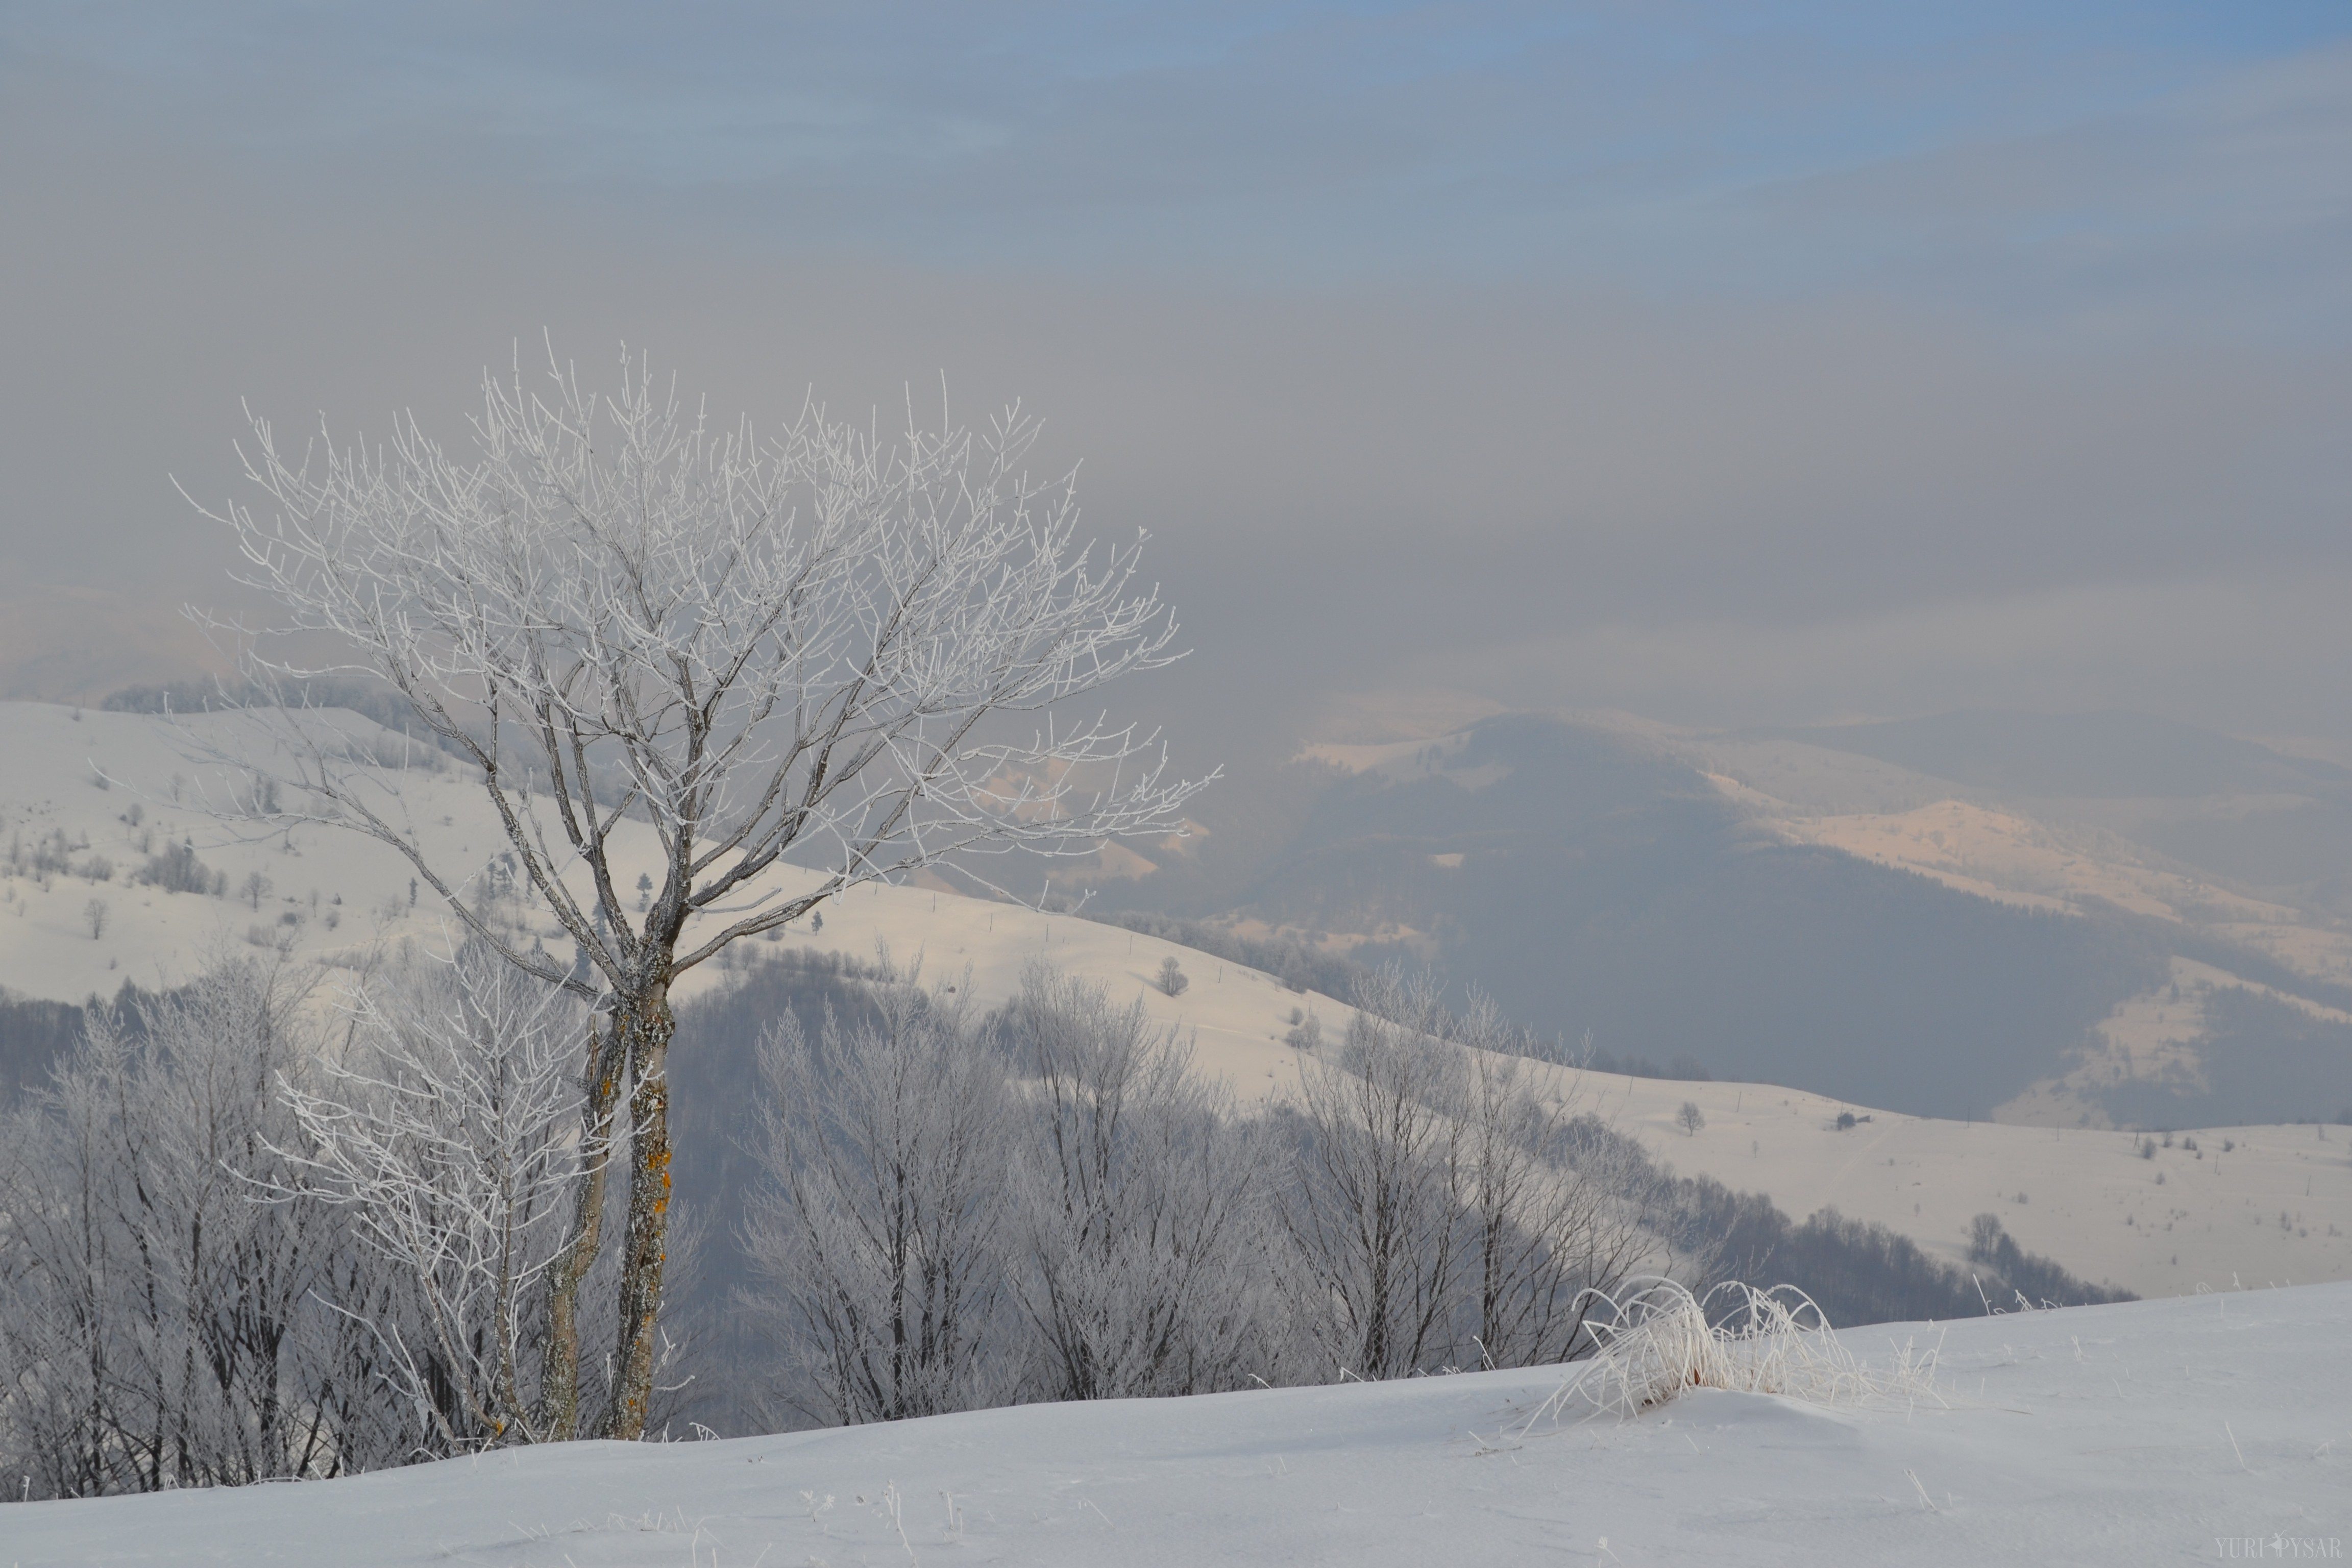 carpathian mountains in snow